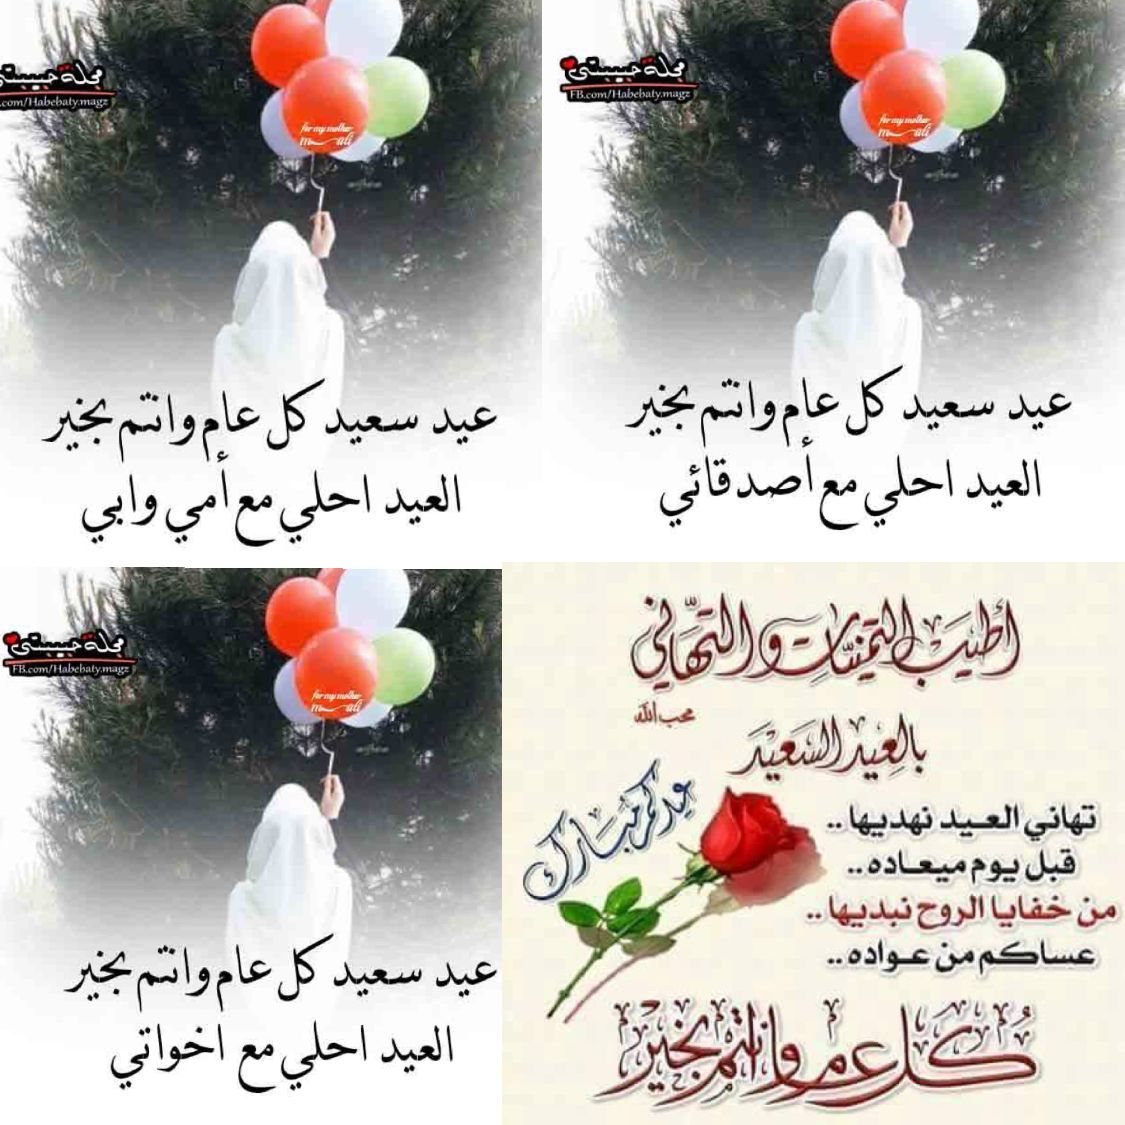 عيد فطر سعيد وكل عام والامه الاسلاميه بالف الف خير Eid Moubark Book Cover Movie Posters Poster